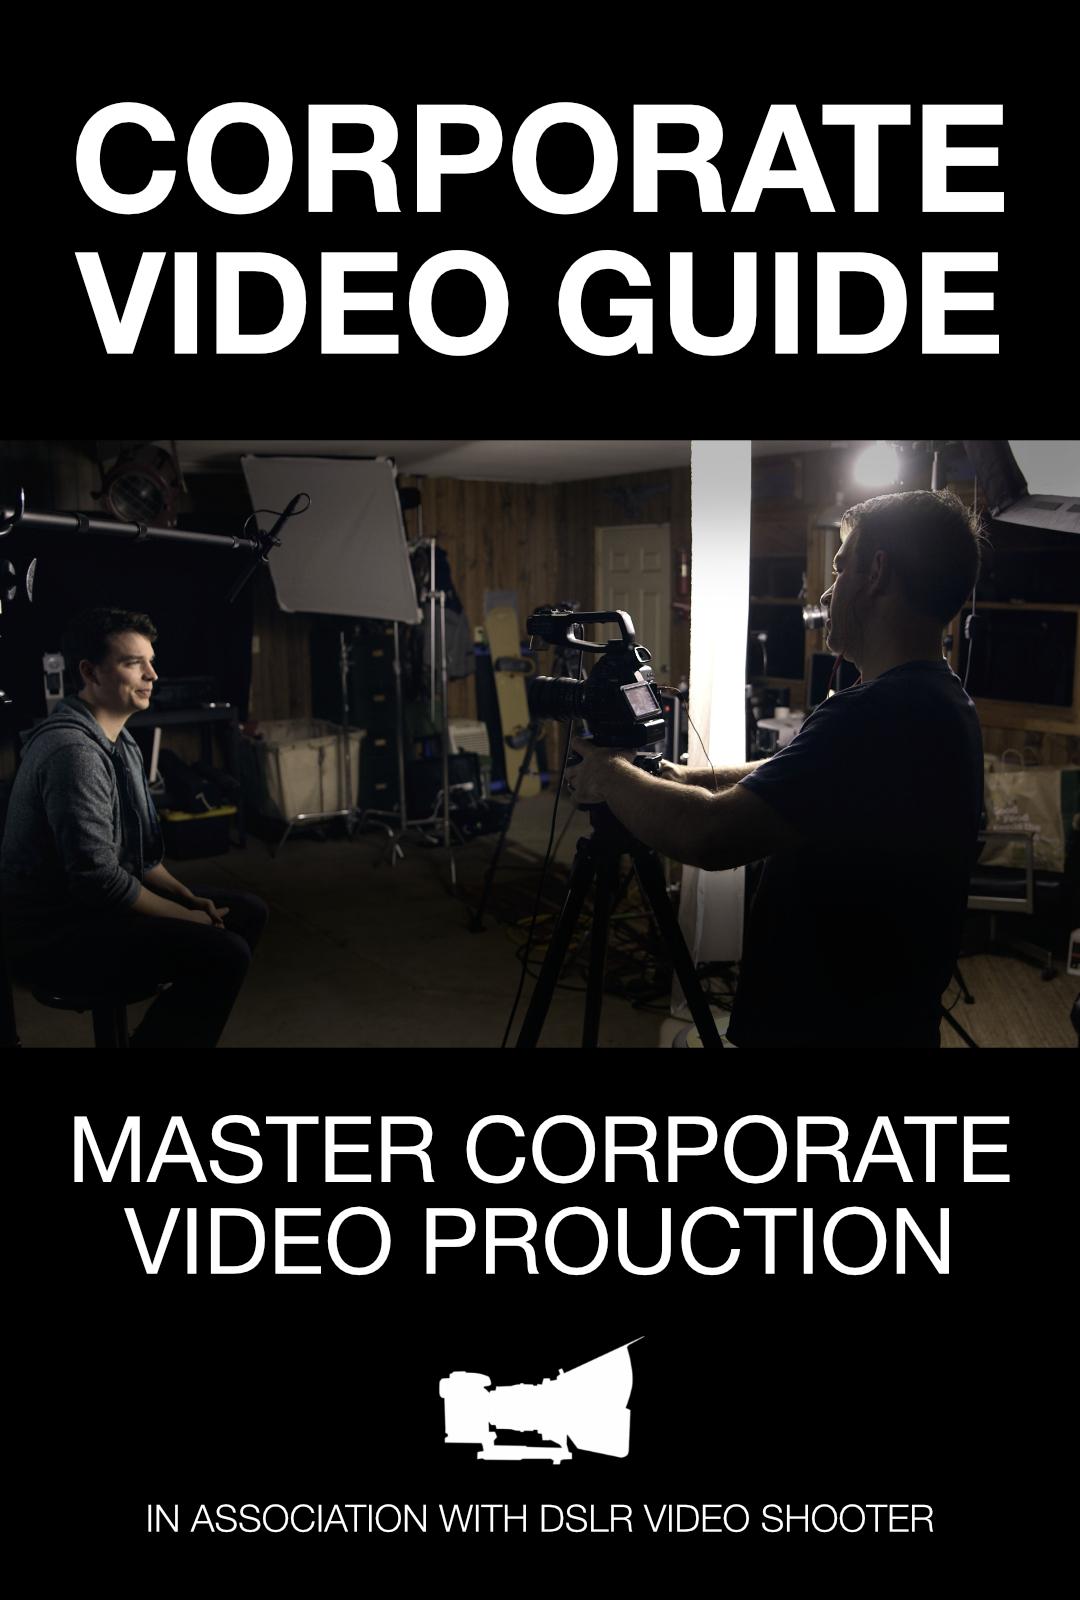 vimeo-poster